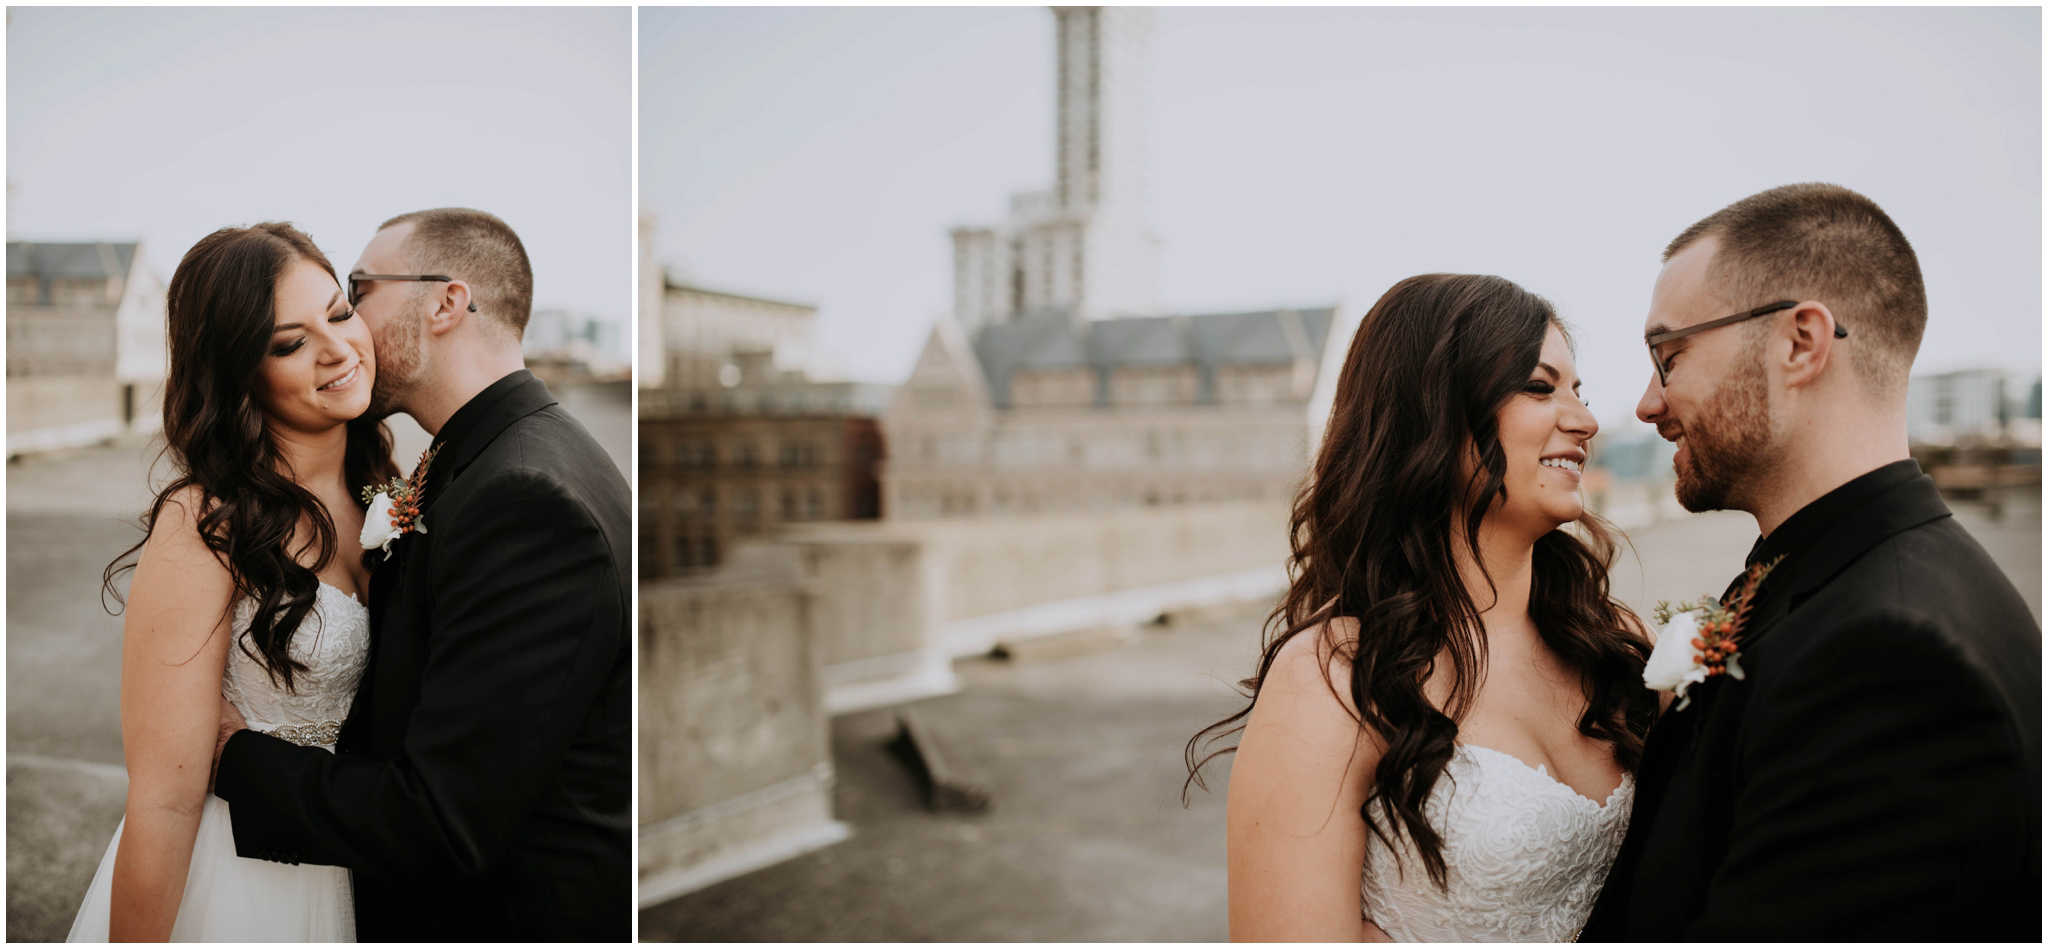 danny+mackenzie+downtown-seattle-axis-wedding-seattle-photographer-043.jpg